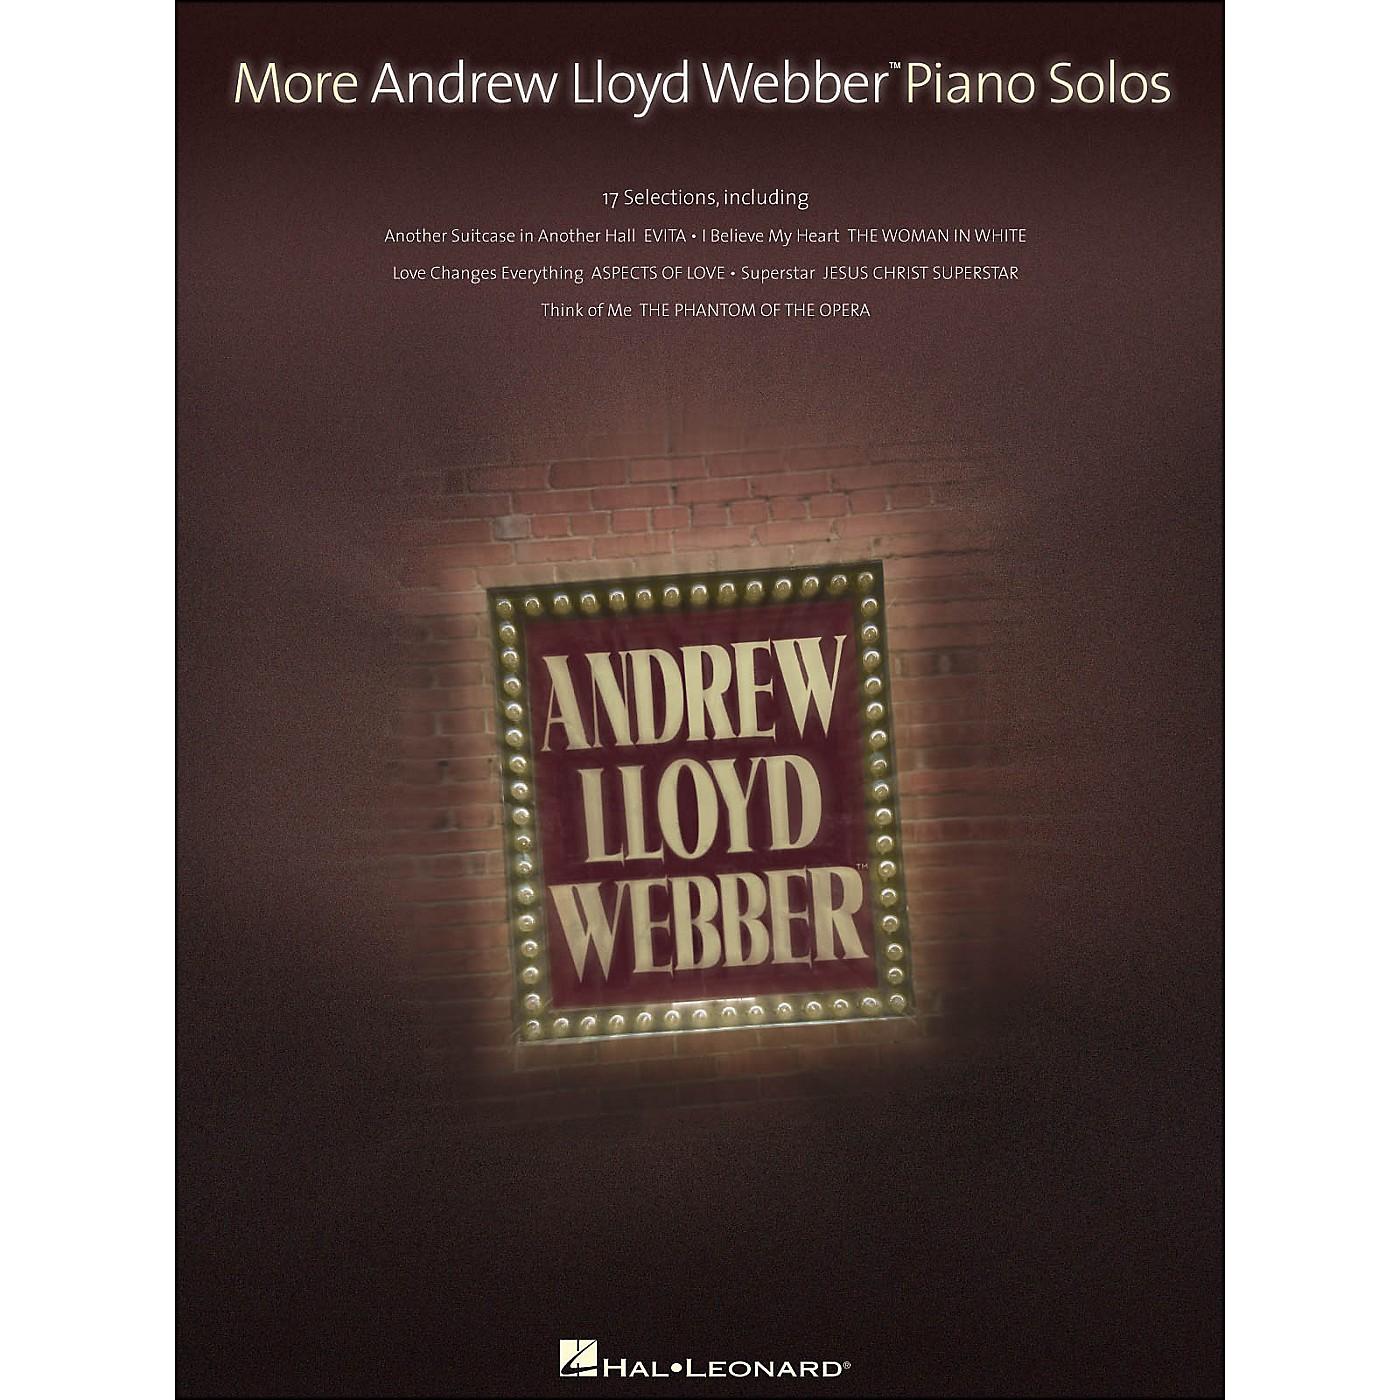 Hal Leonard More Andrew Lloyd Webber Piano Solos thumbnail